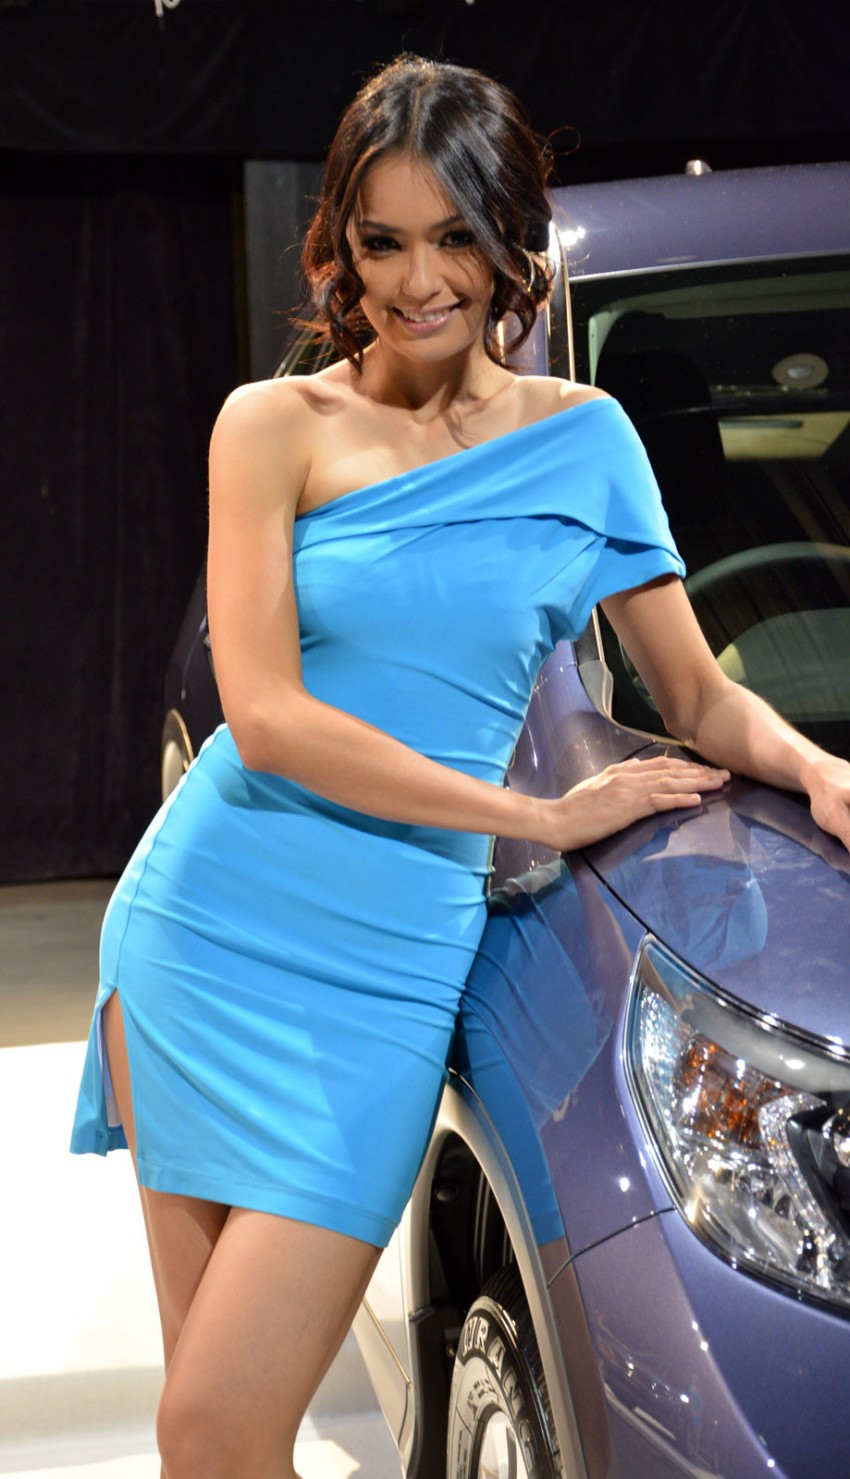 Honda CR-V launched – 2.0 litre, CKD, RM148,800 Image #159146